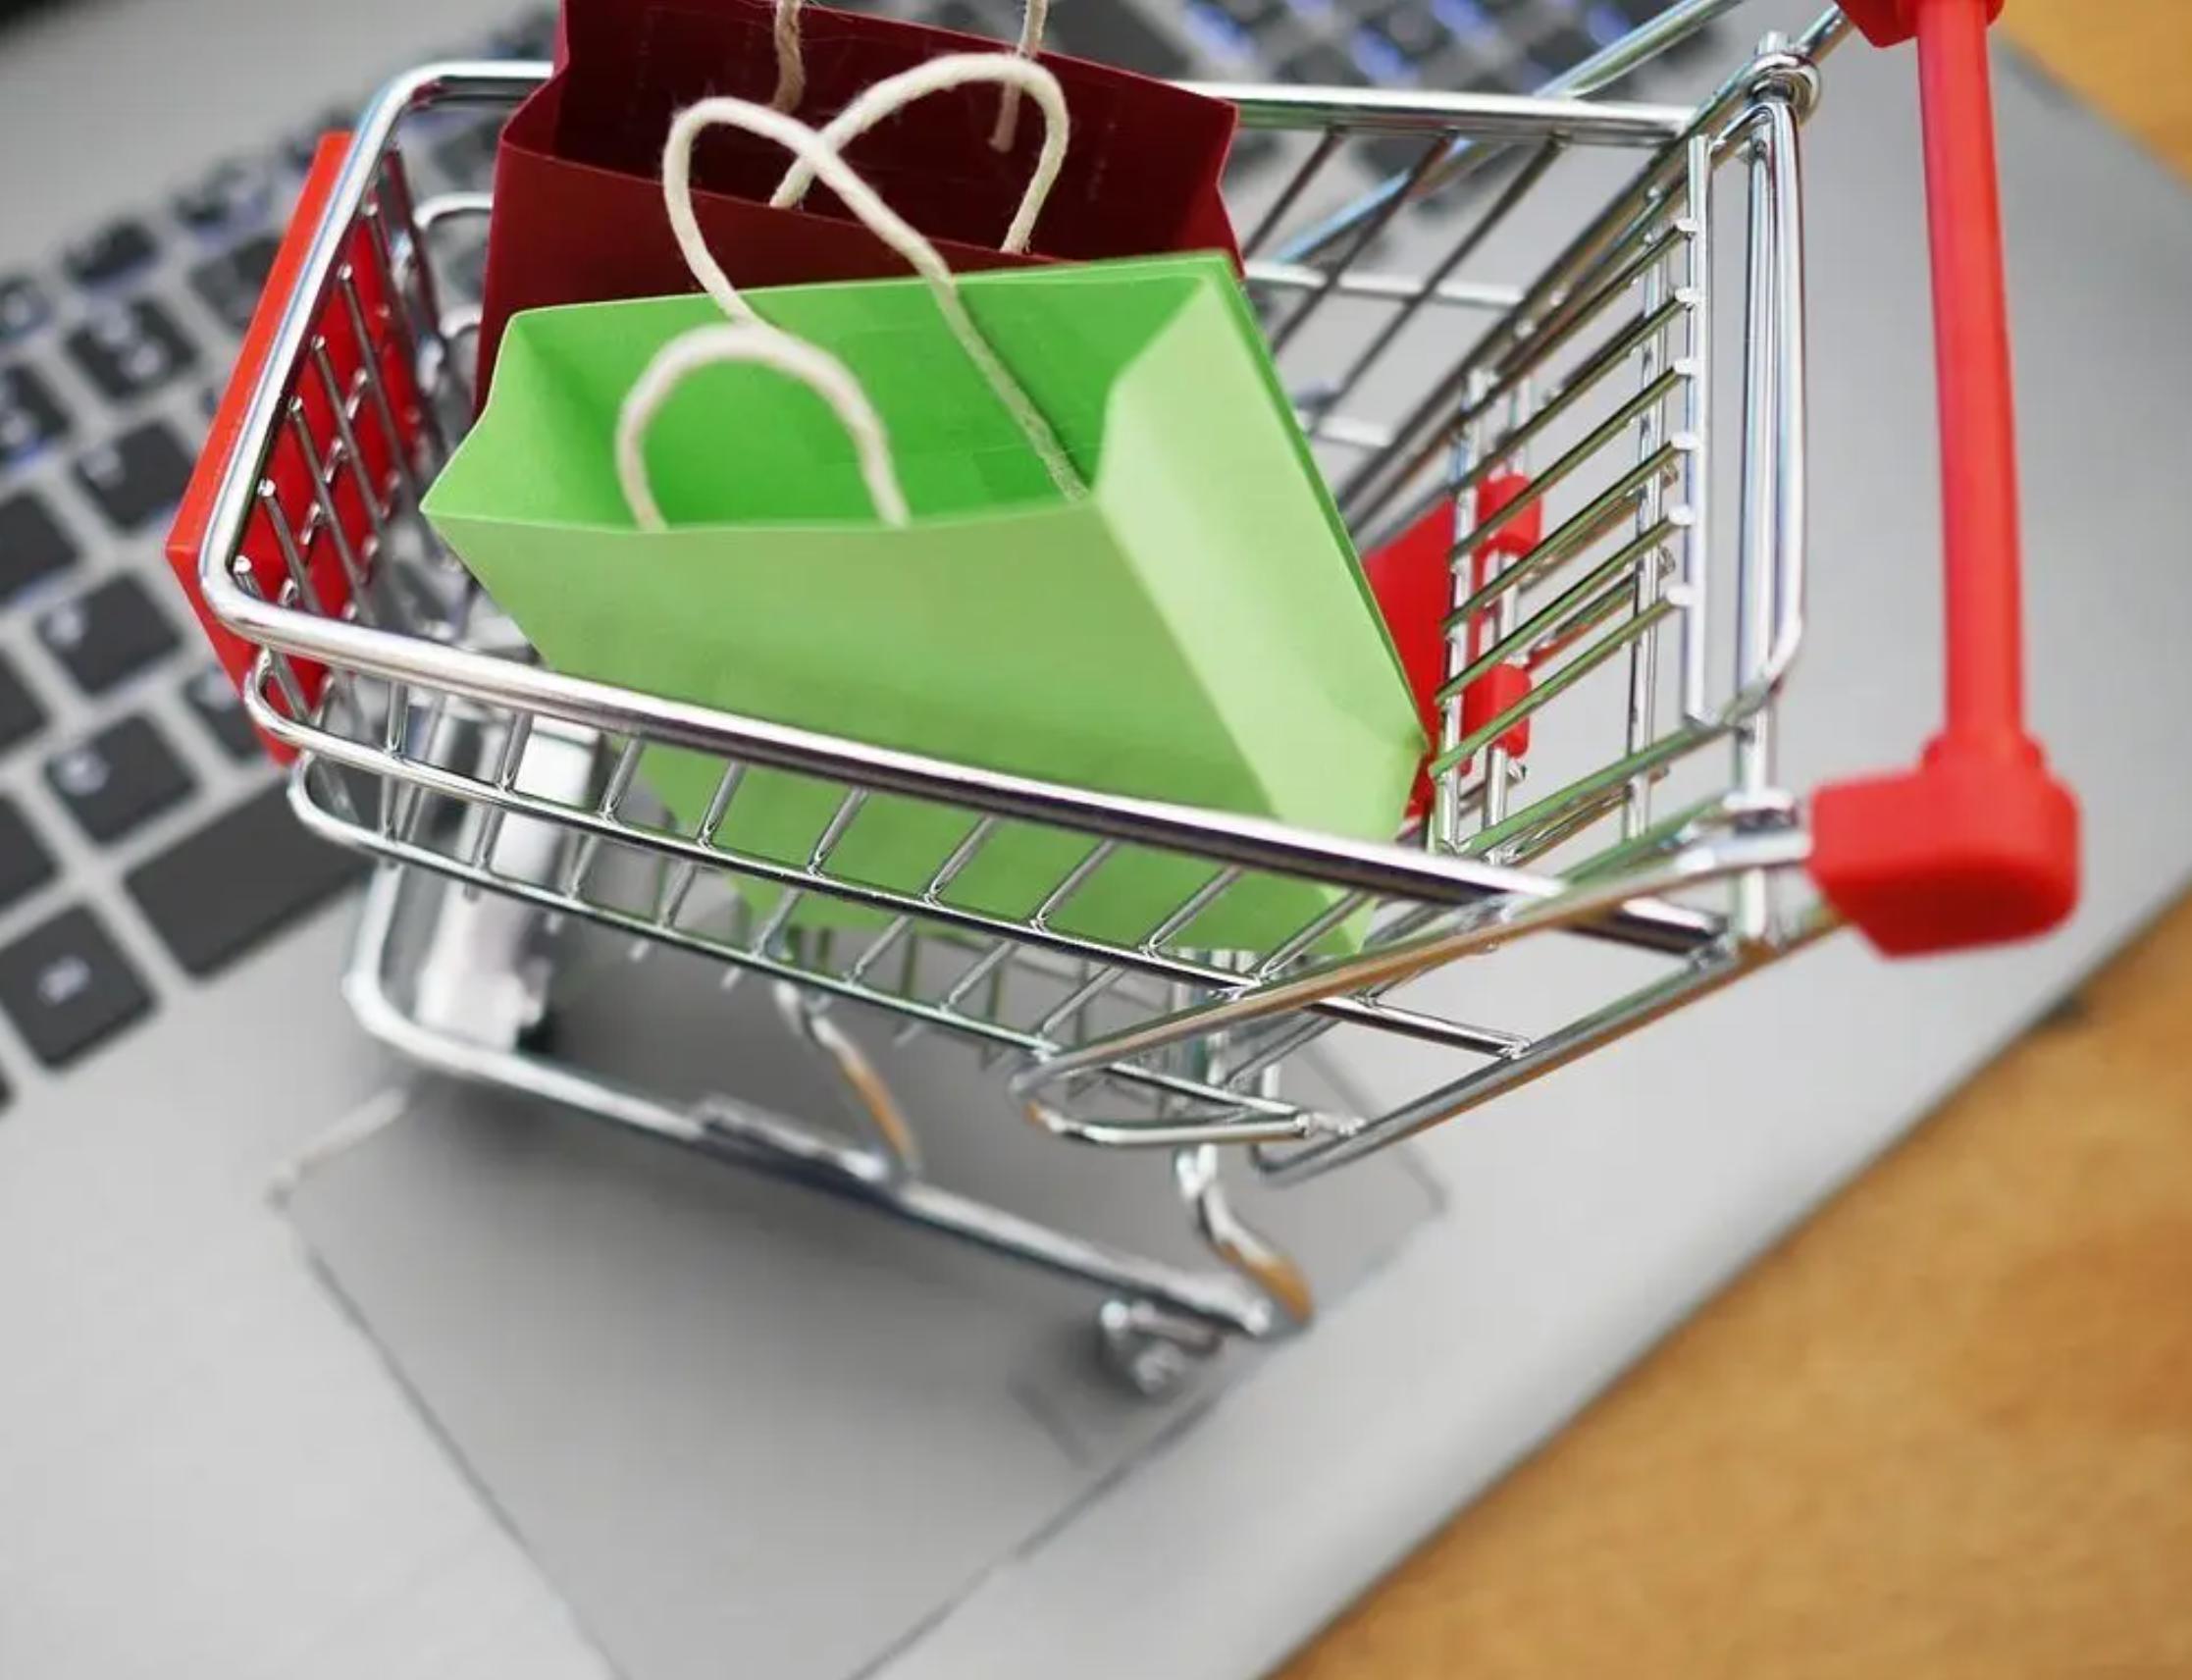 [Supermarkt-Deals KW24/21] Angebote/Aktionen/Rabatte/Coupons (14.-19.06.2021)